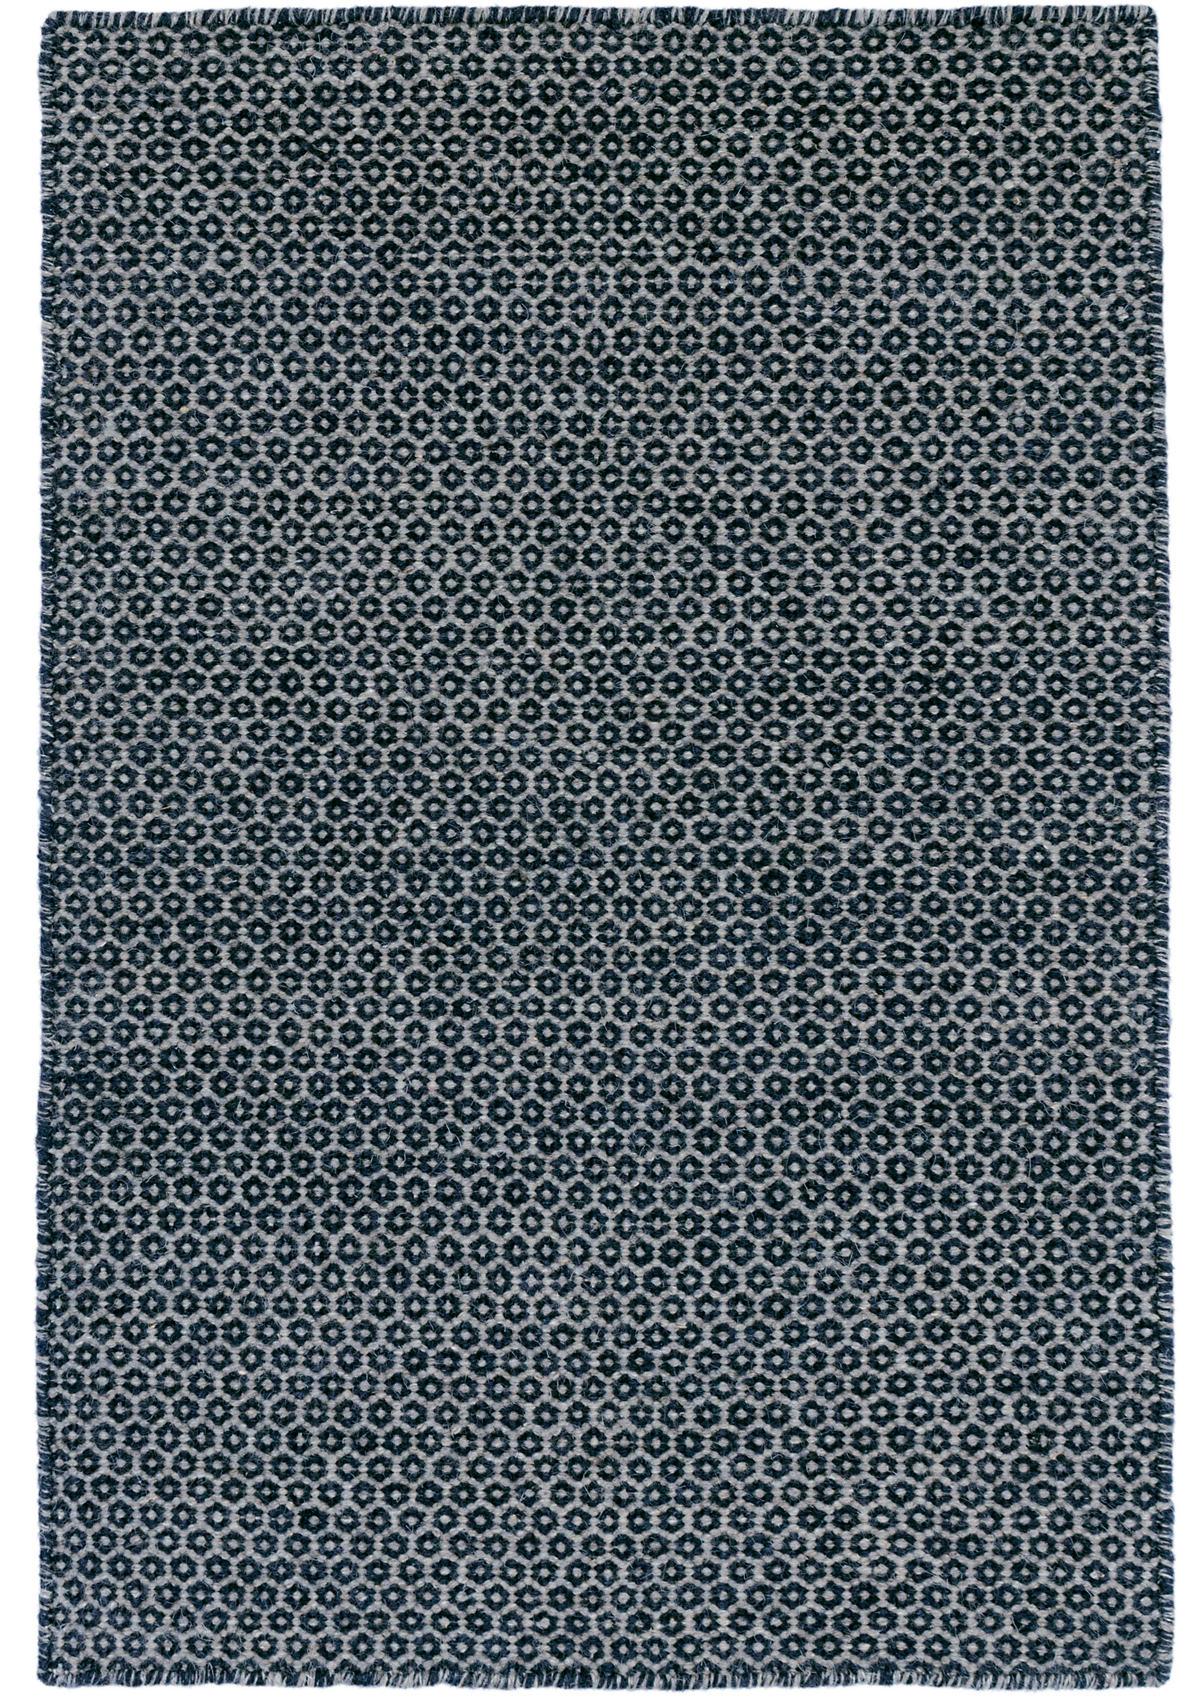 Honeycomb Indigo/Grey Wool Woven Rug